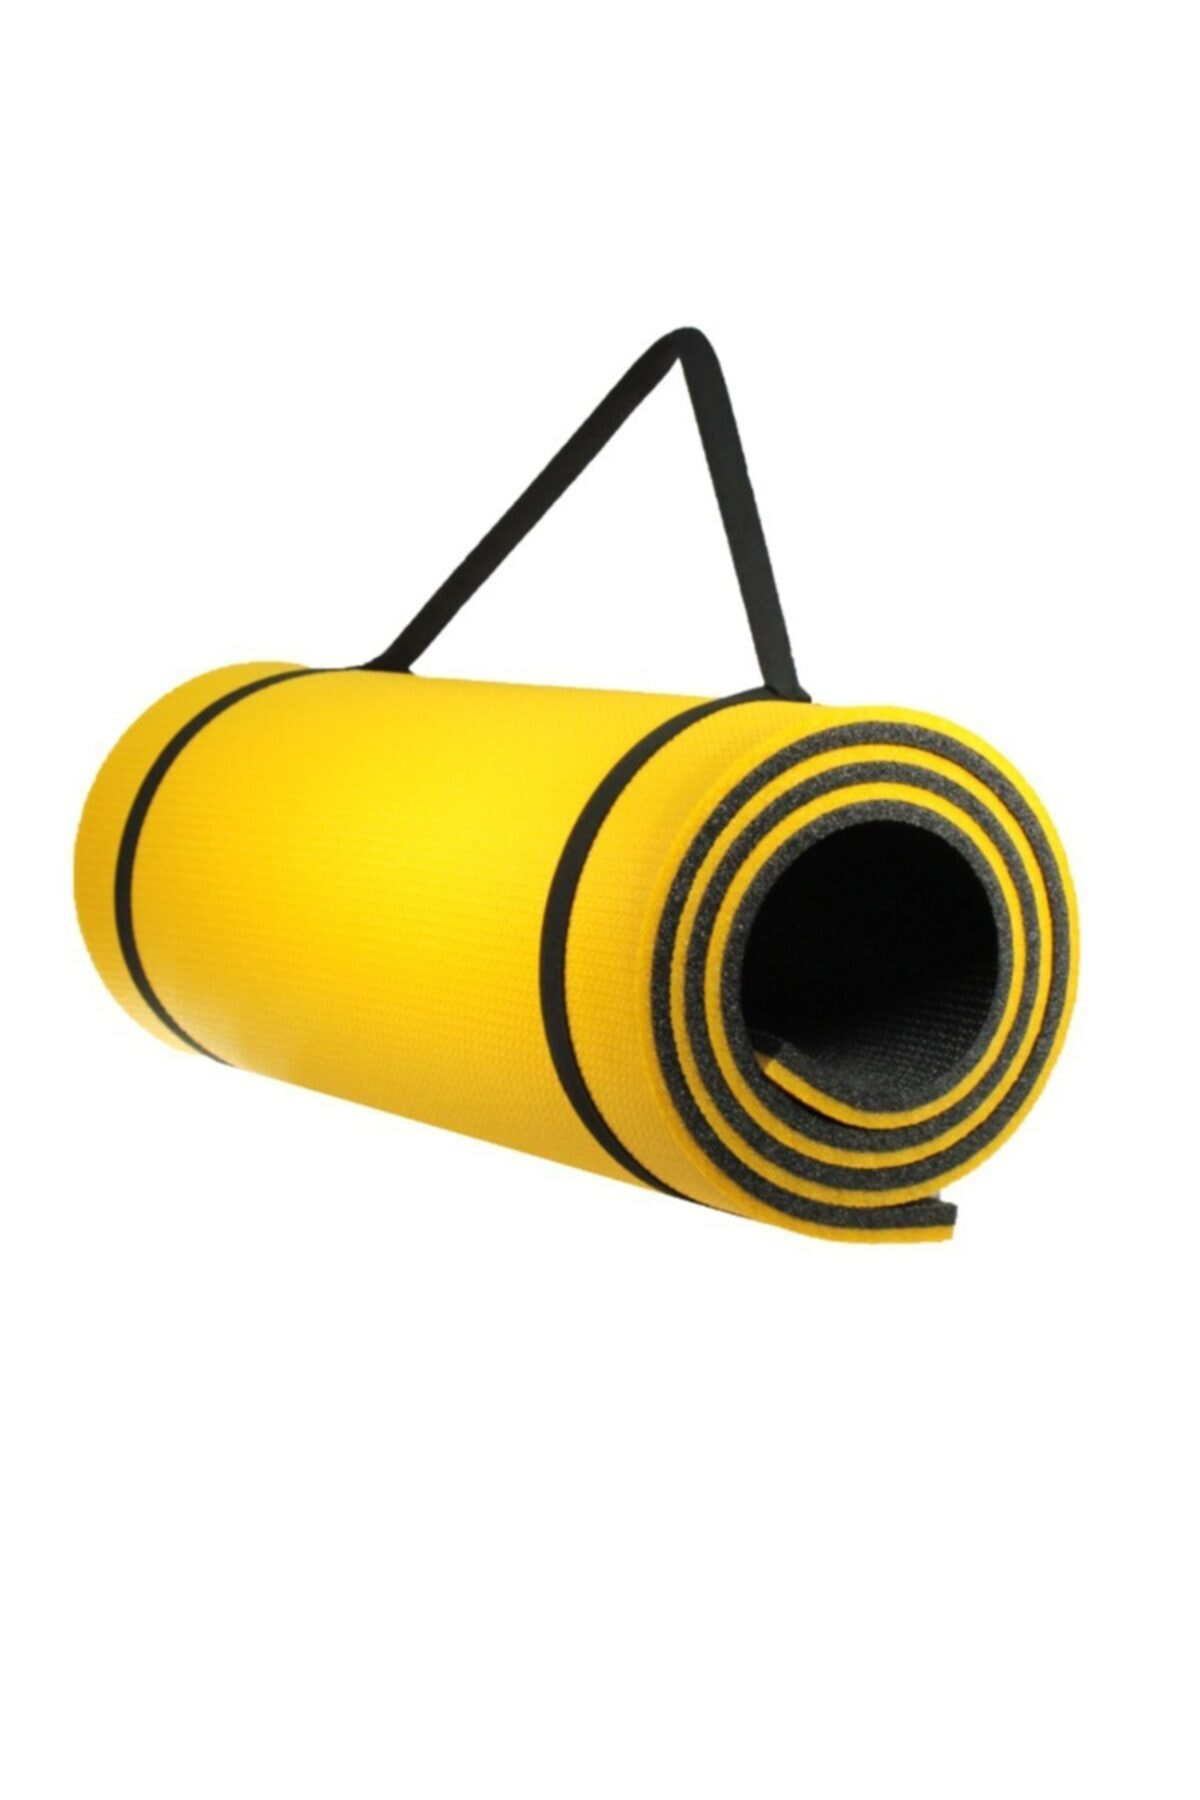 Walke 16 Mm Çift Taraflı Sarı-siyah Pilates Matı 180 Cm 2